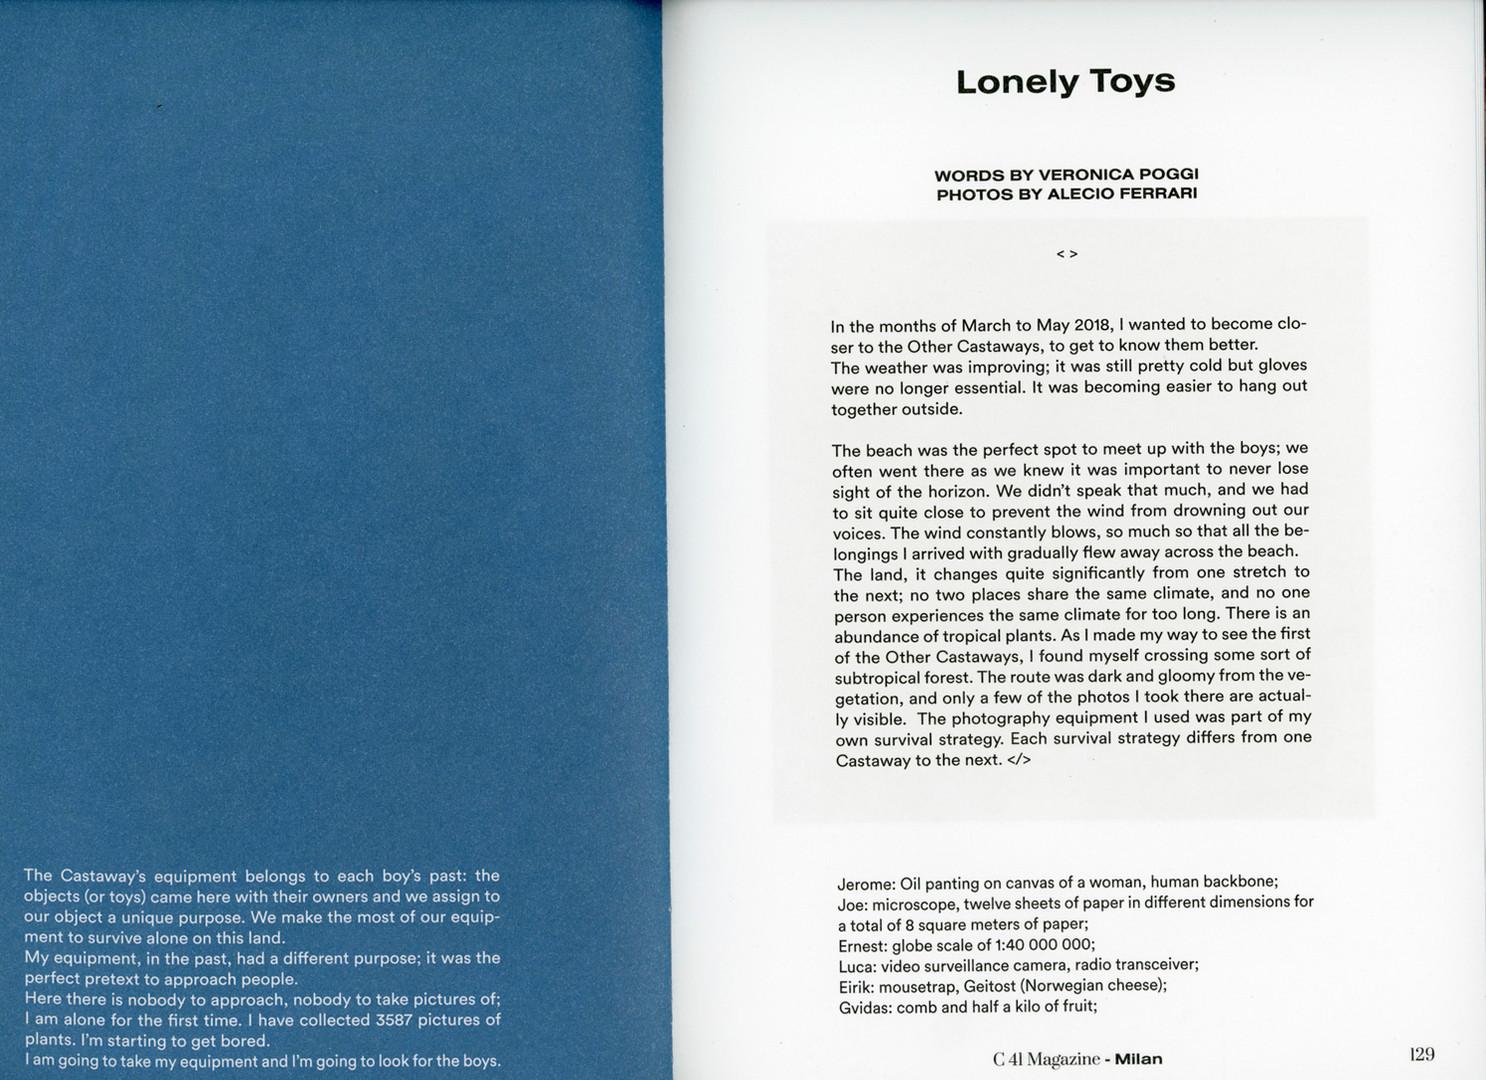 Lonely Toys_printed-2.jpg